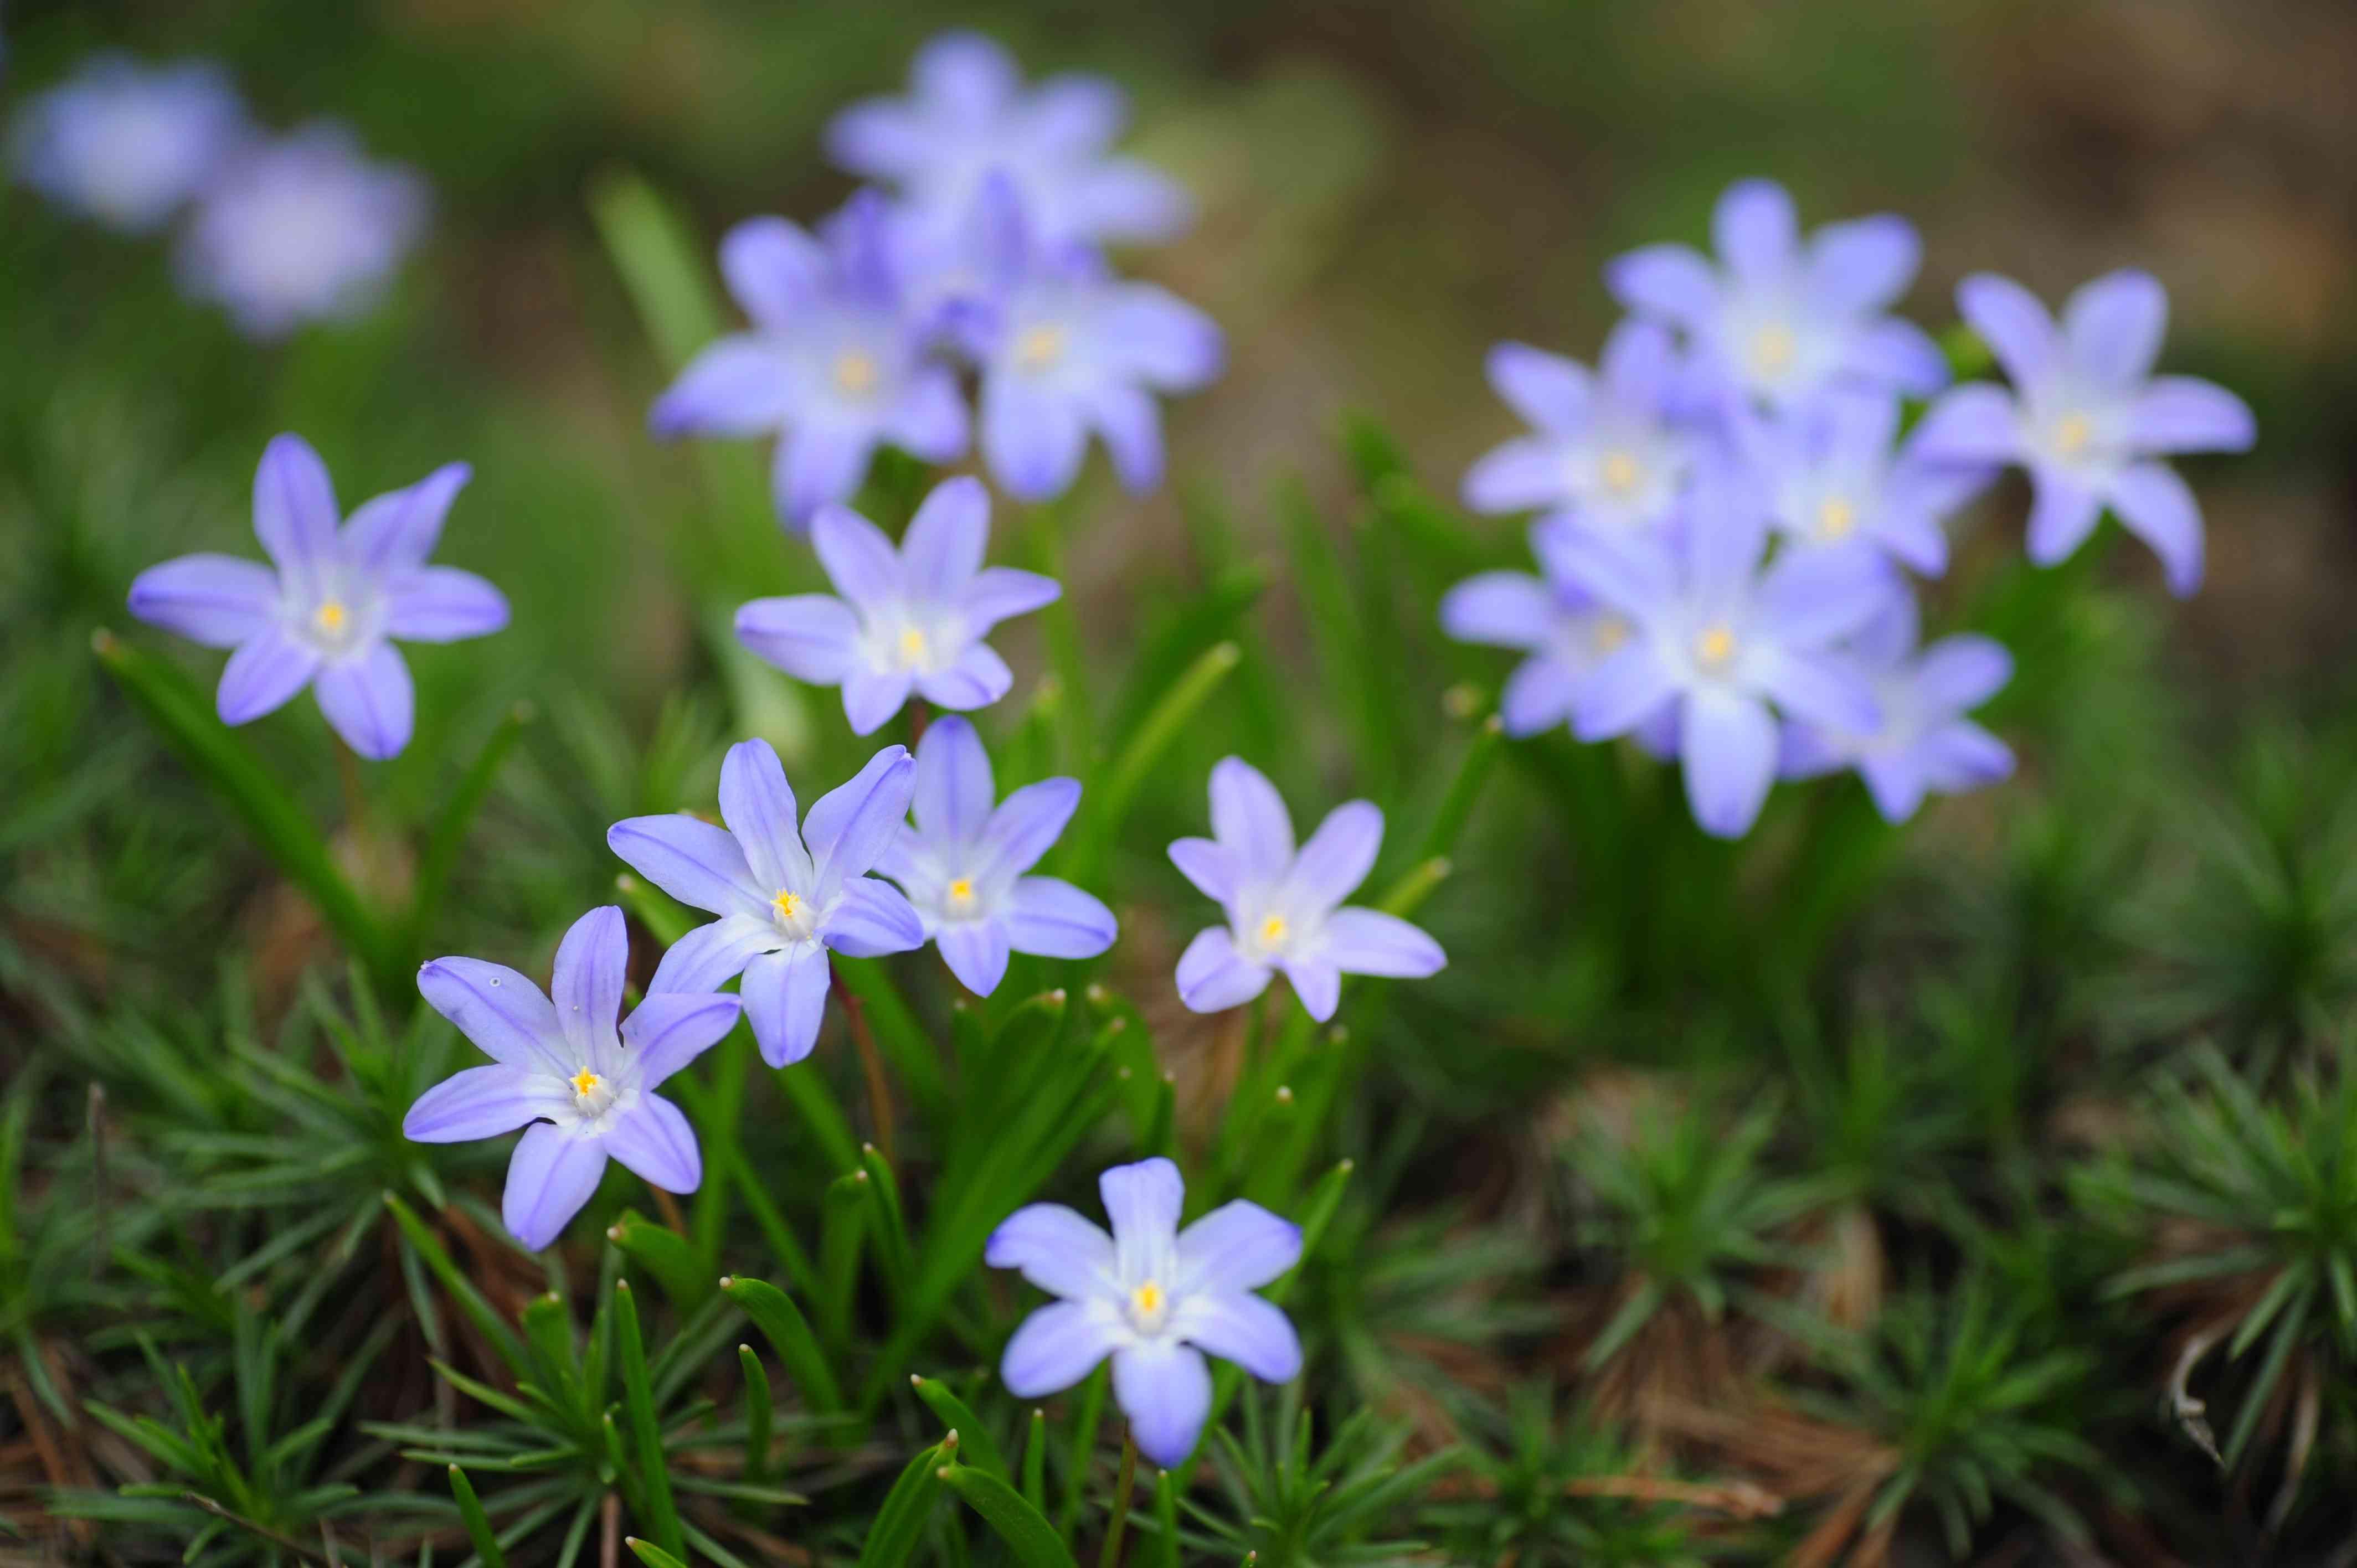 Blue glory of the snow flowers in deer resistant garden